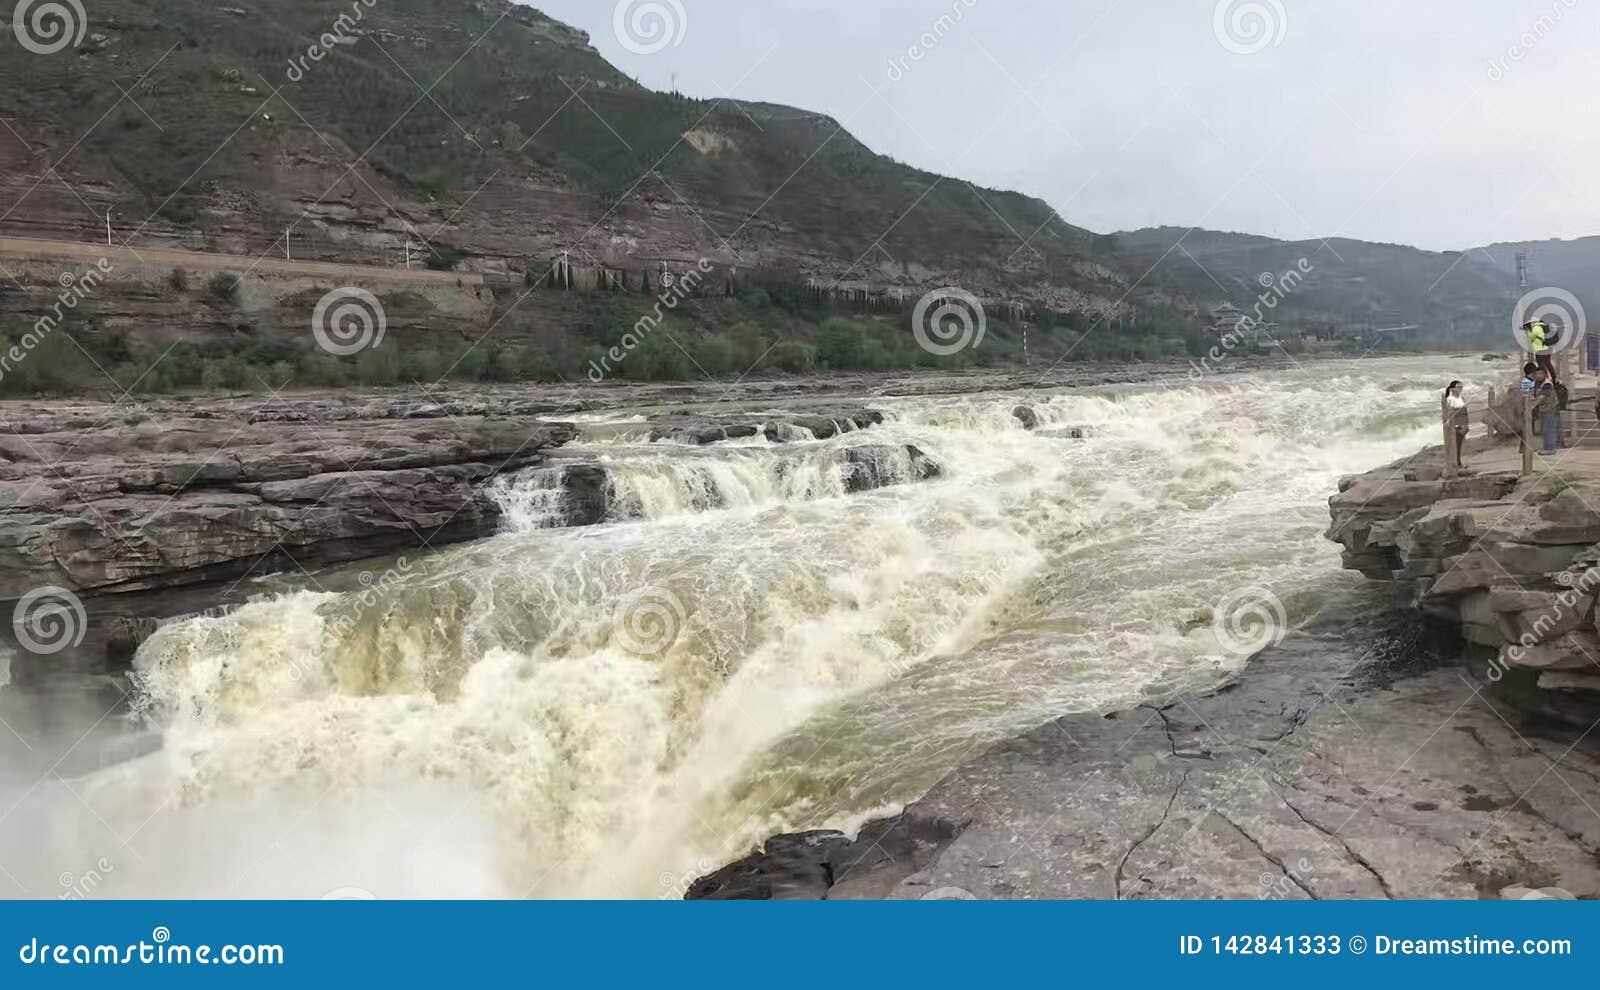 O Rio Amarelo, cachoeira de Hukou, o rio grande, as ondas brancas, as ondas